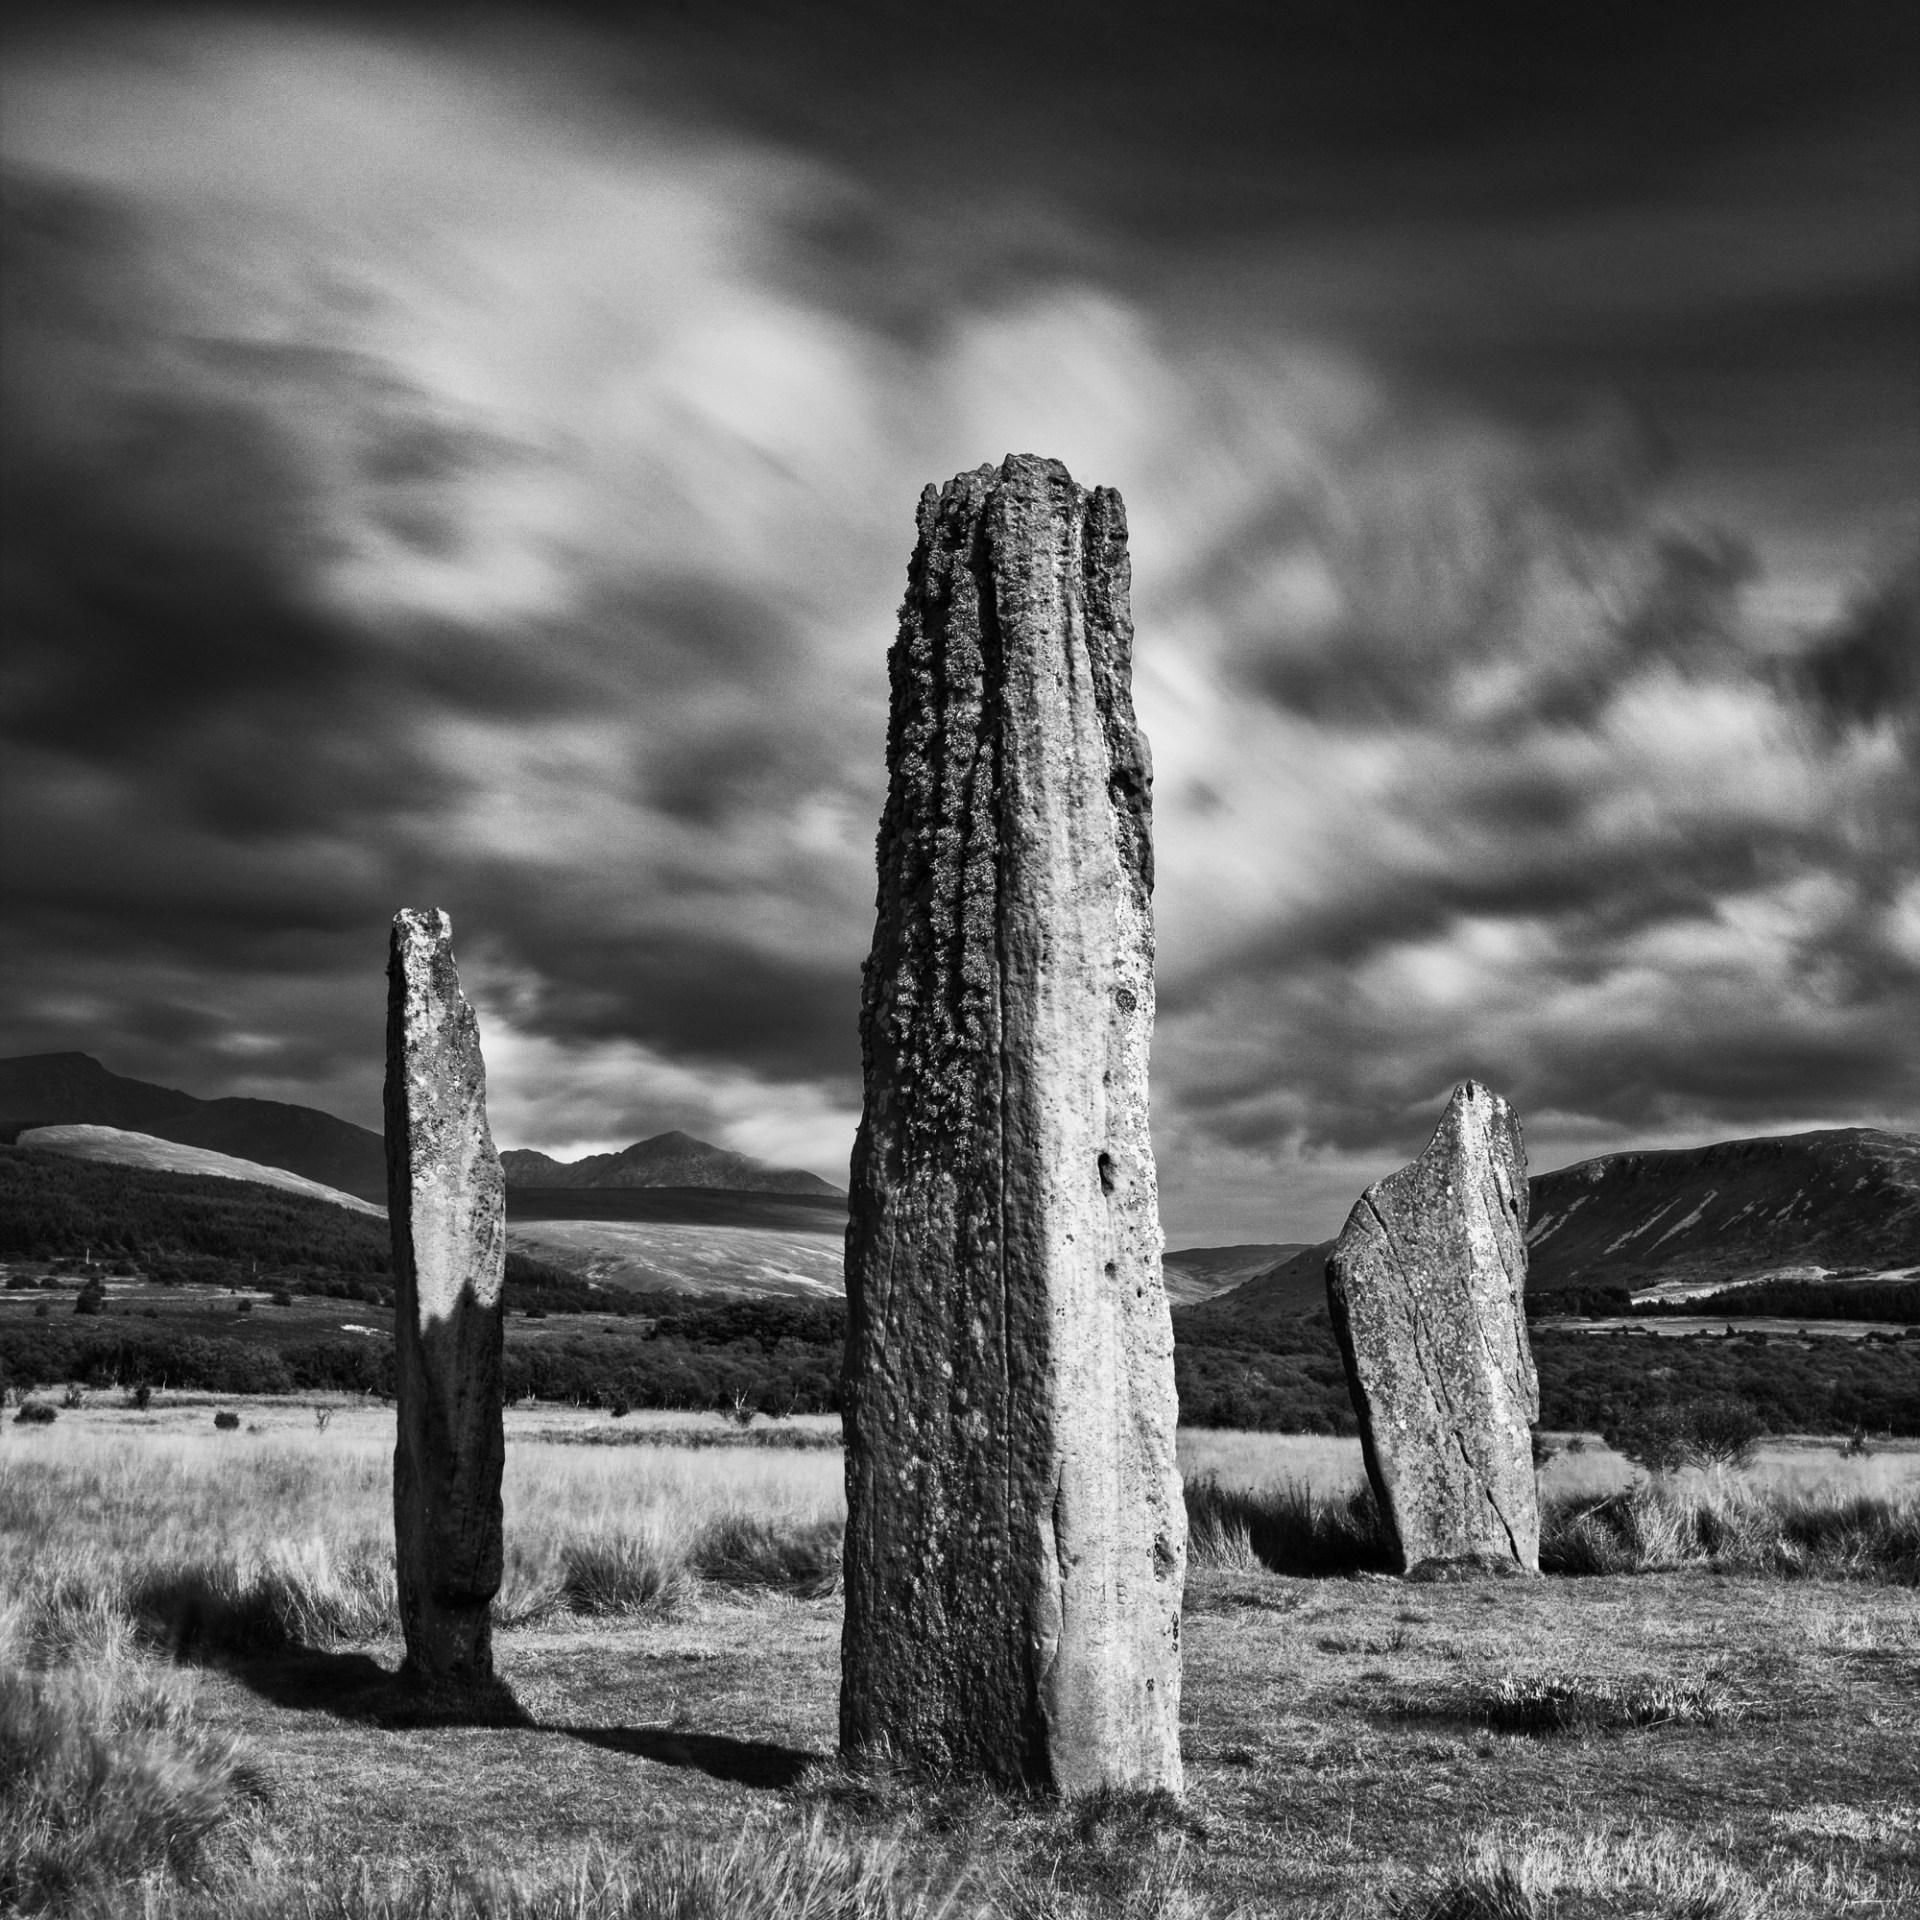 stone_circle_photography-2.jpg